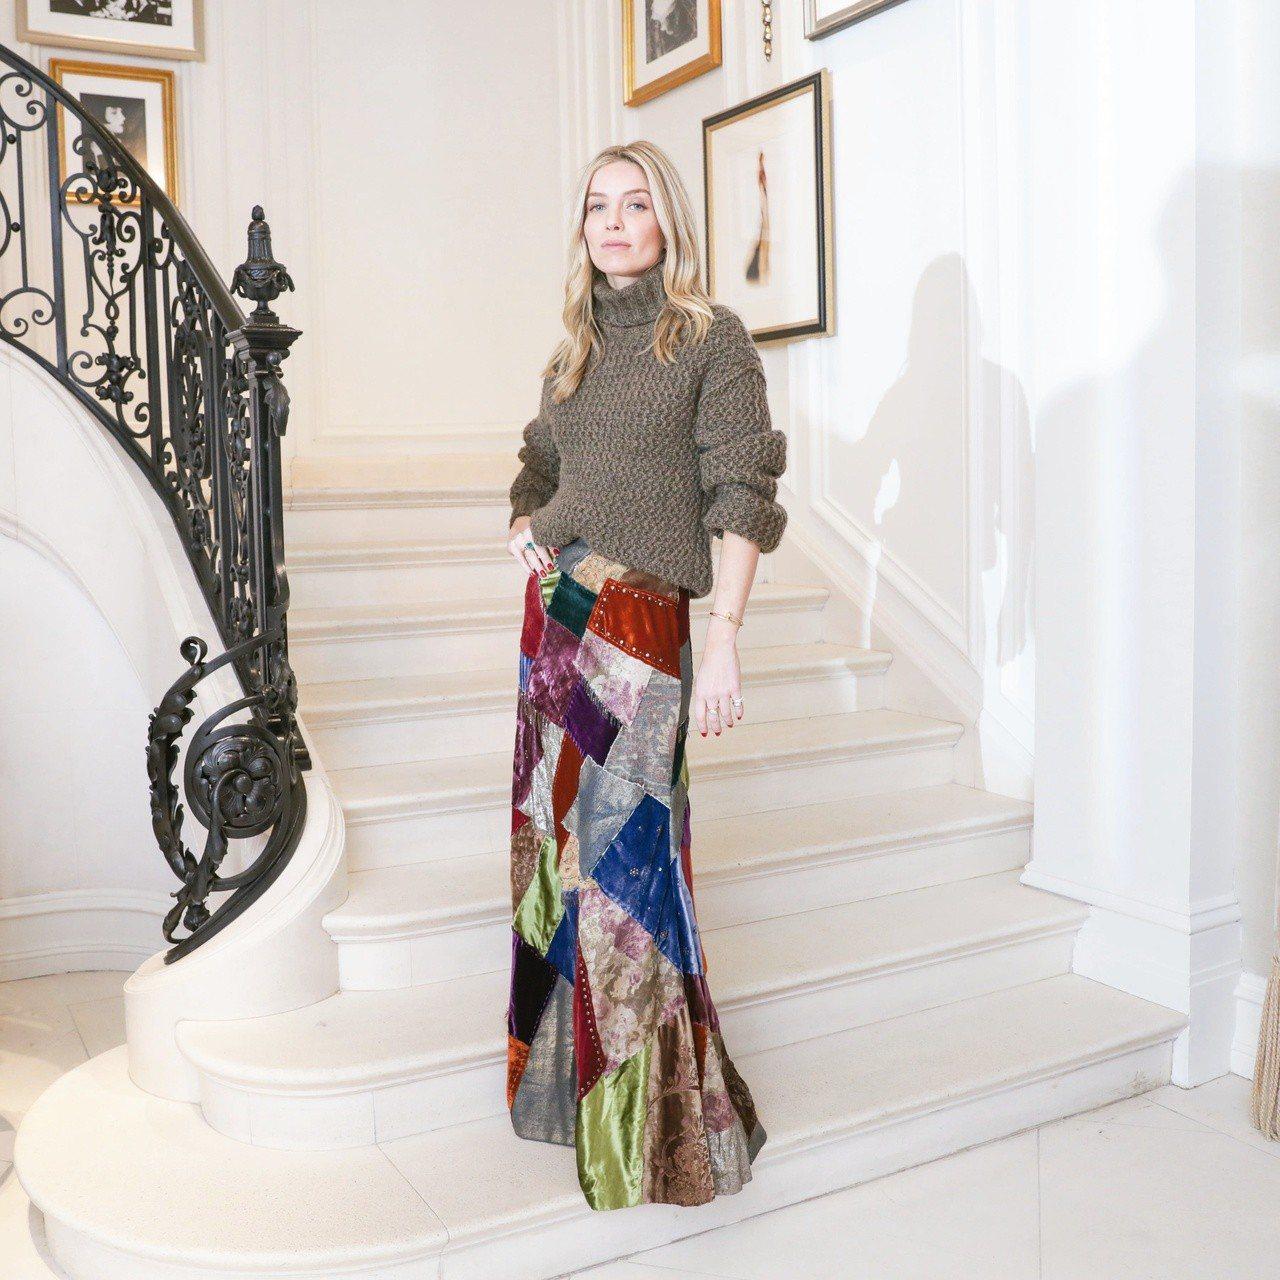 演員安娜貝爾華麗絲身上的Ralph Lauren Collection 2018...